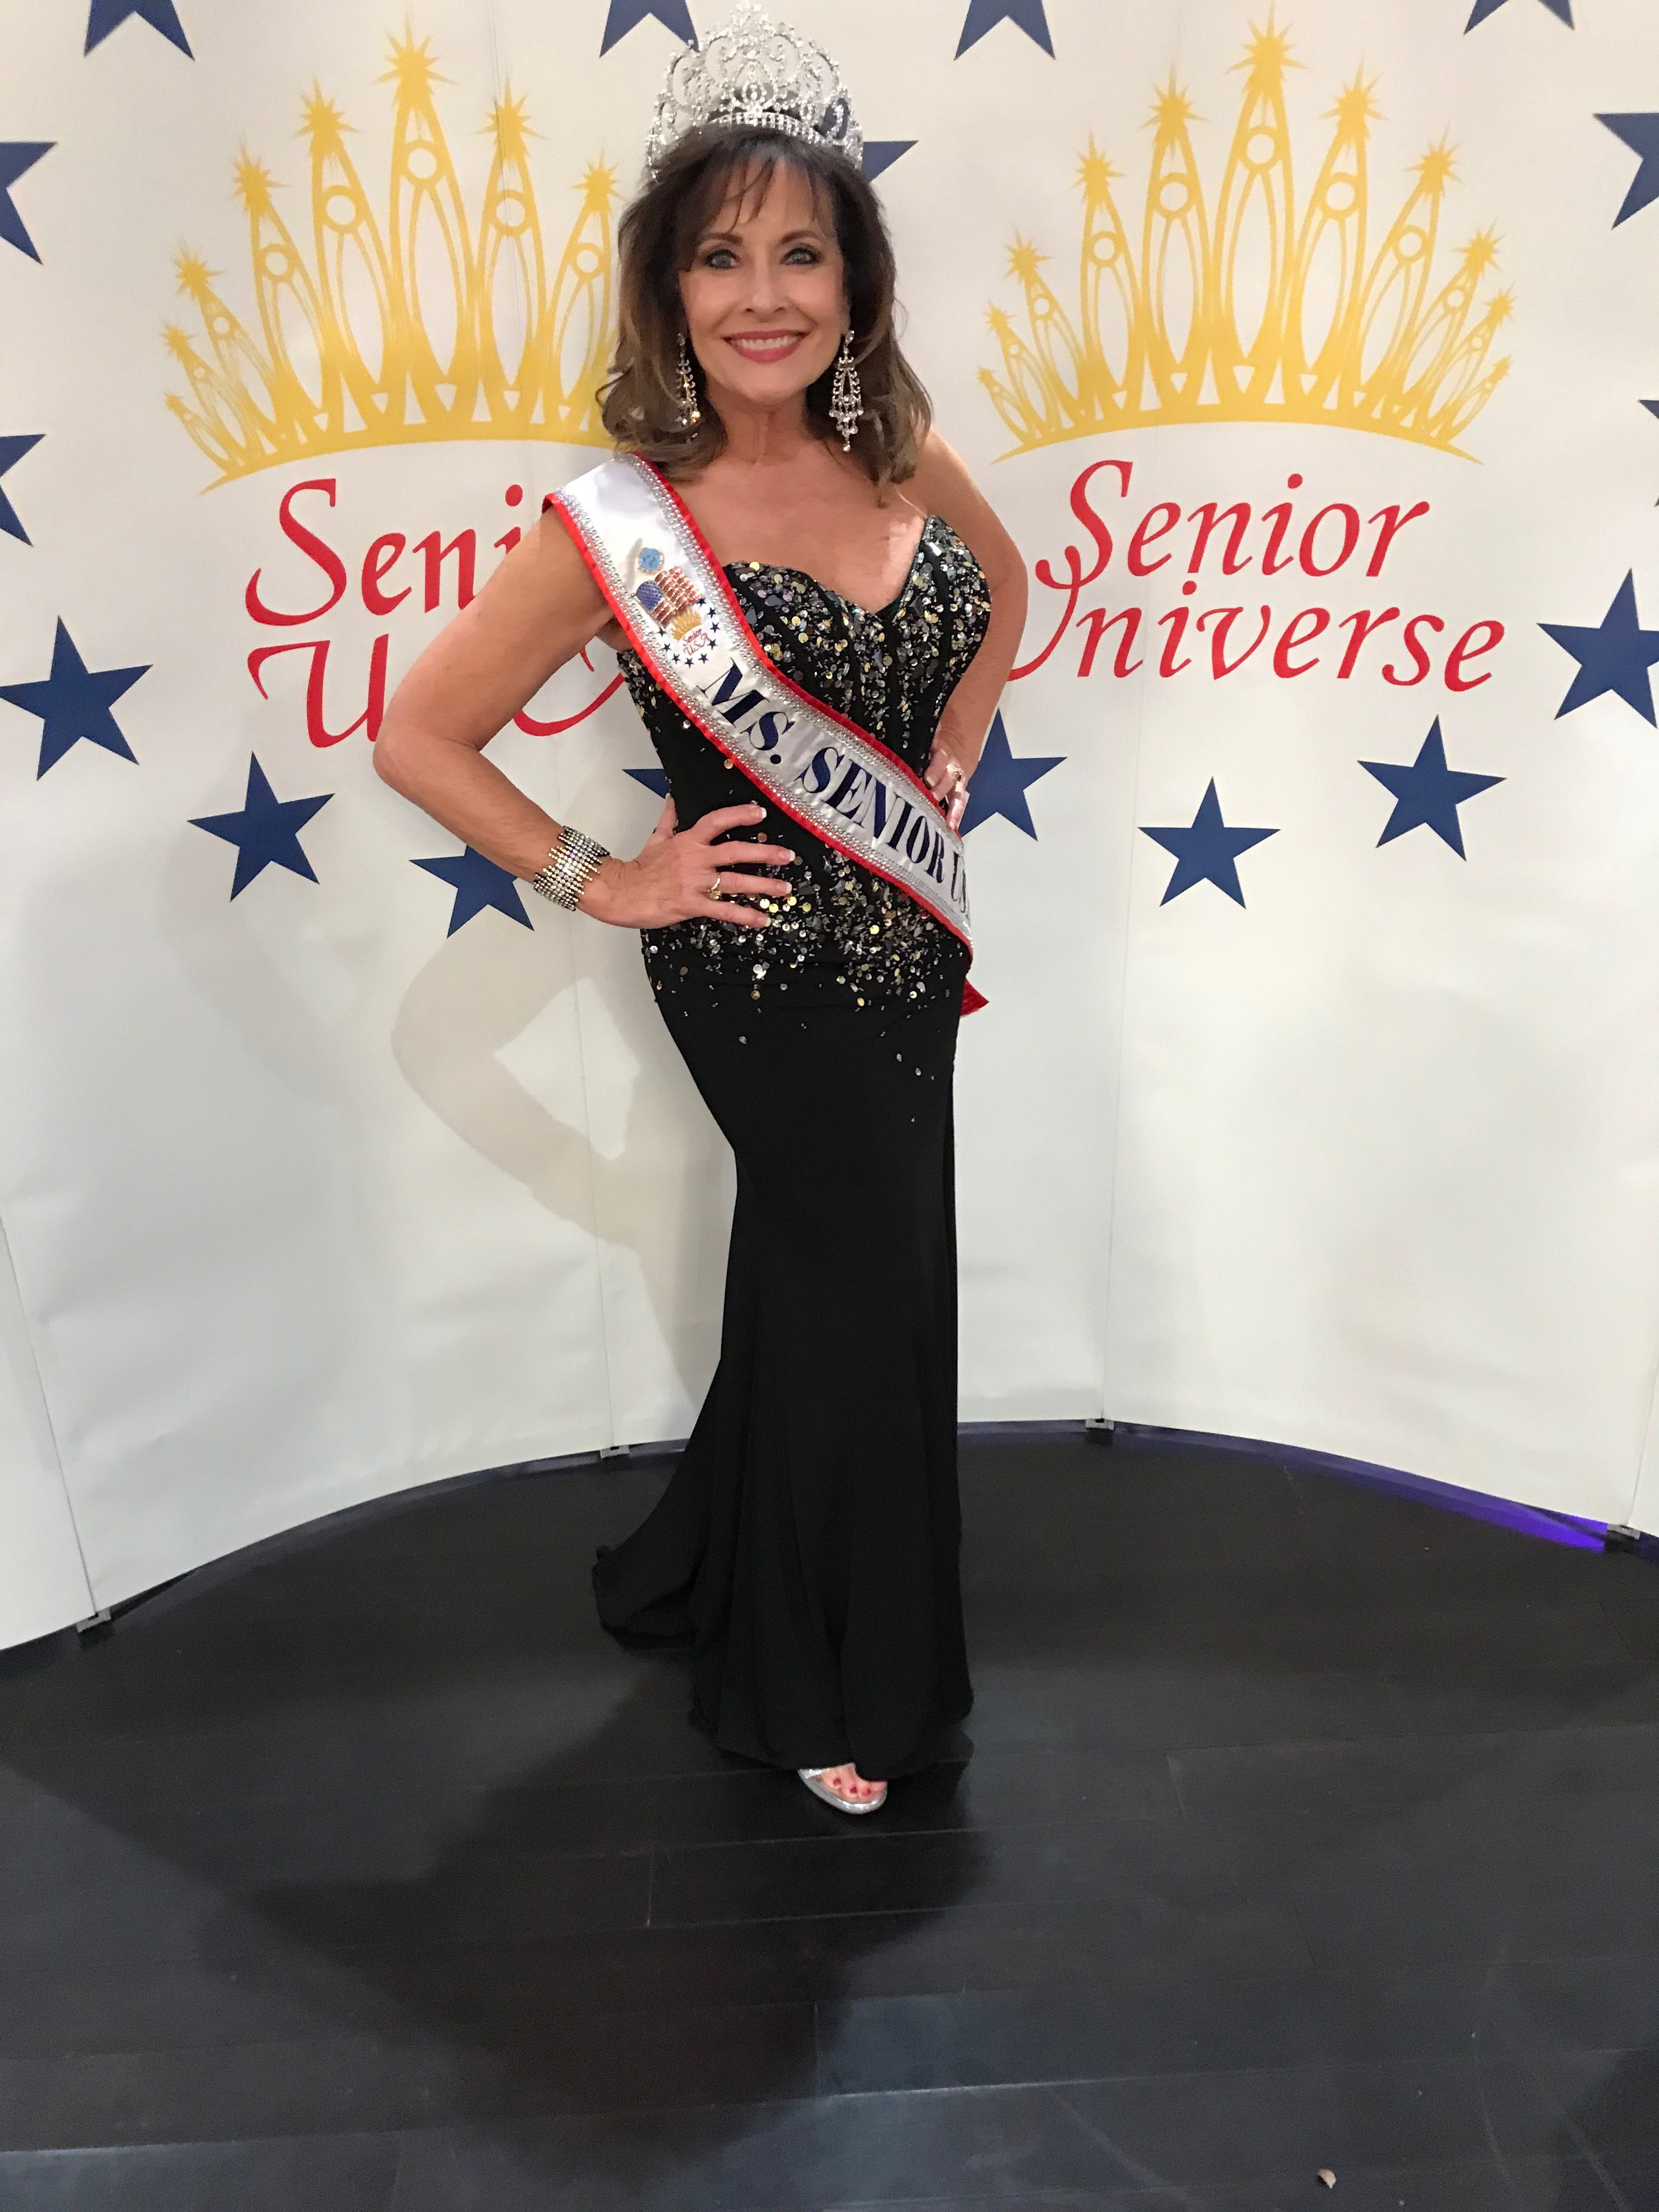 Trussville woman wins Ms. Senior Universe pageant in Las Vegas